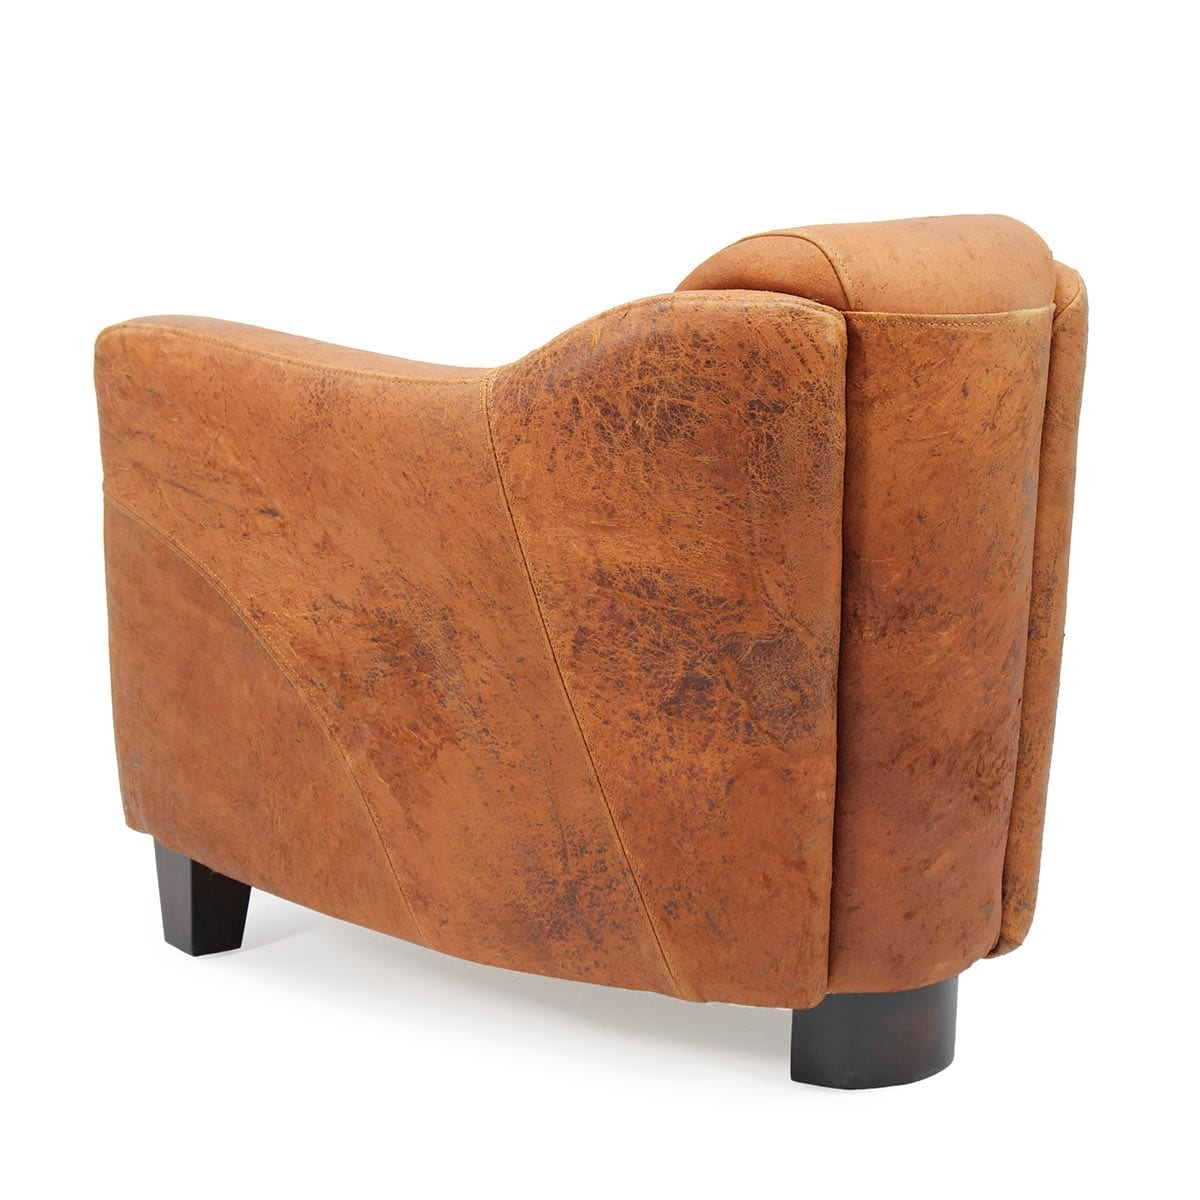 Commercial sofas, armchairs Bugatti in Francisco Segarra.